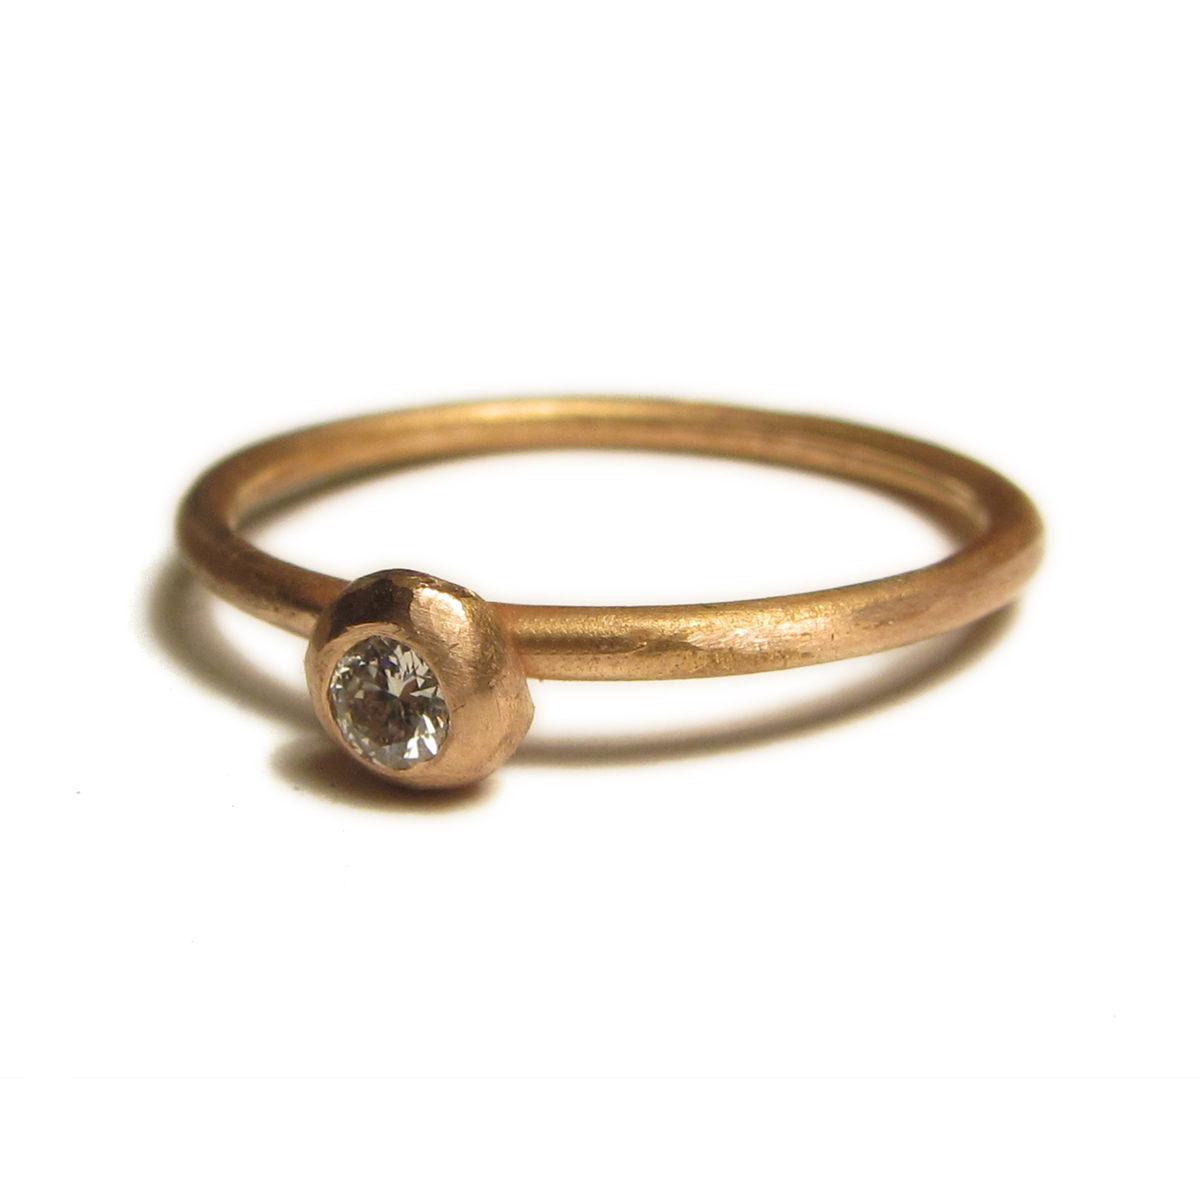 18 Carat Rose Gold Ring With Diamond Stacking Rings. Turtle Wedding Rings. Taken Wedding Rings. Byu Rings. Traditional Engagement Rings. Pear Shaped Wedding Rings. Cut Marquise Engagement Rings. Love Marriage Rings. 0.34 Engagement Rings